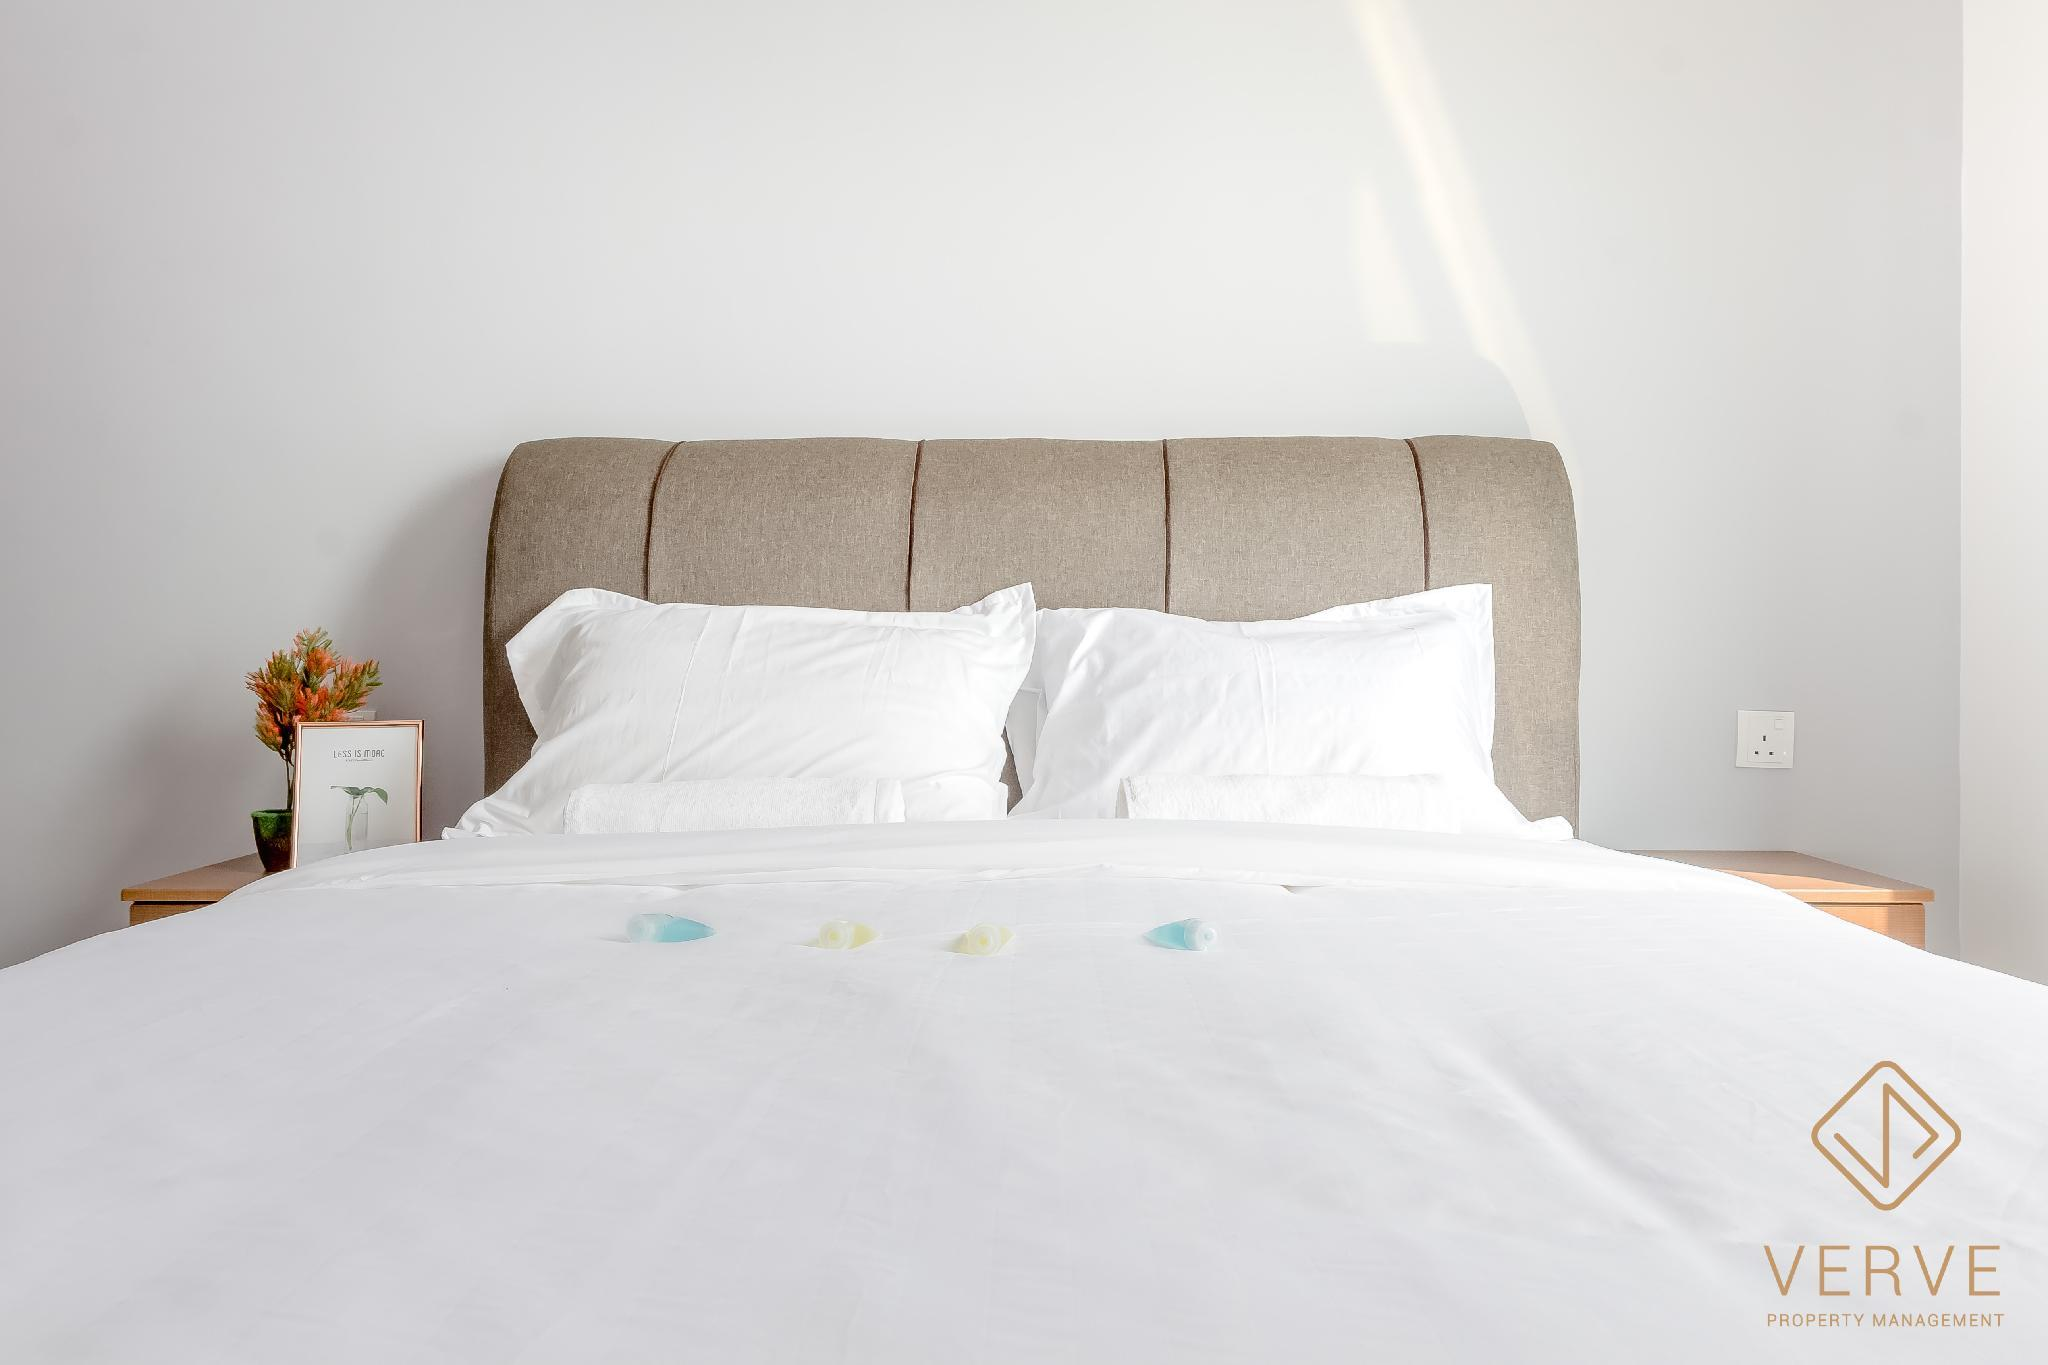 Casa Keyangan Suites By Verve  6 Pax  EECH30